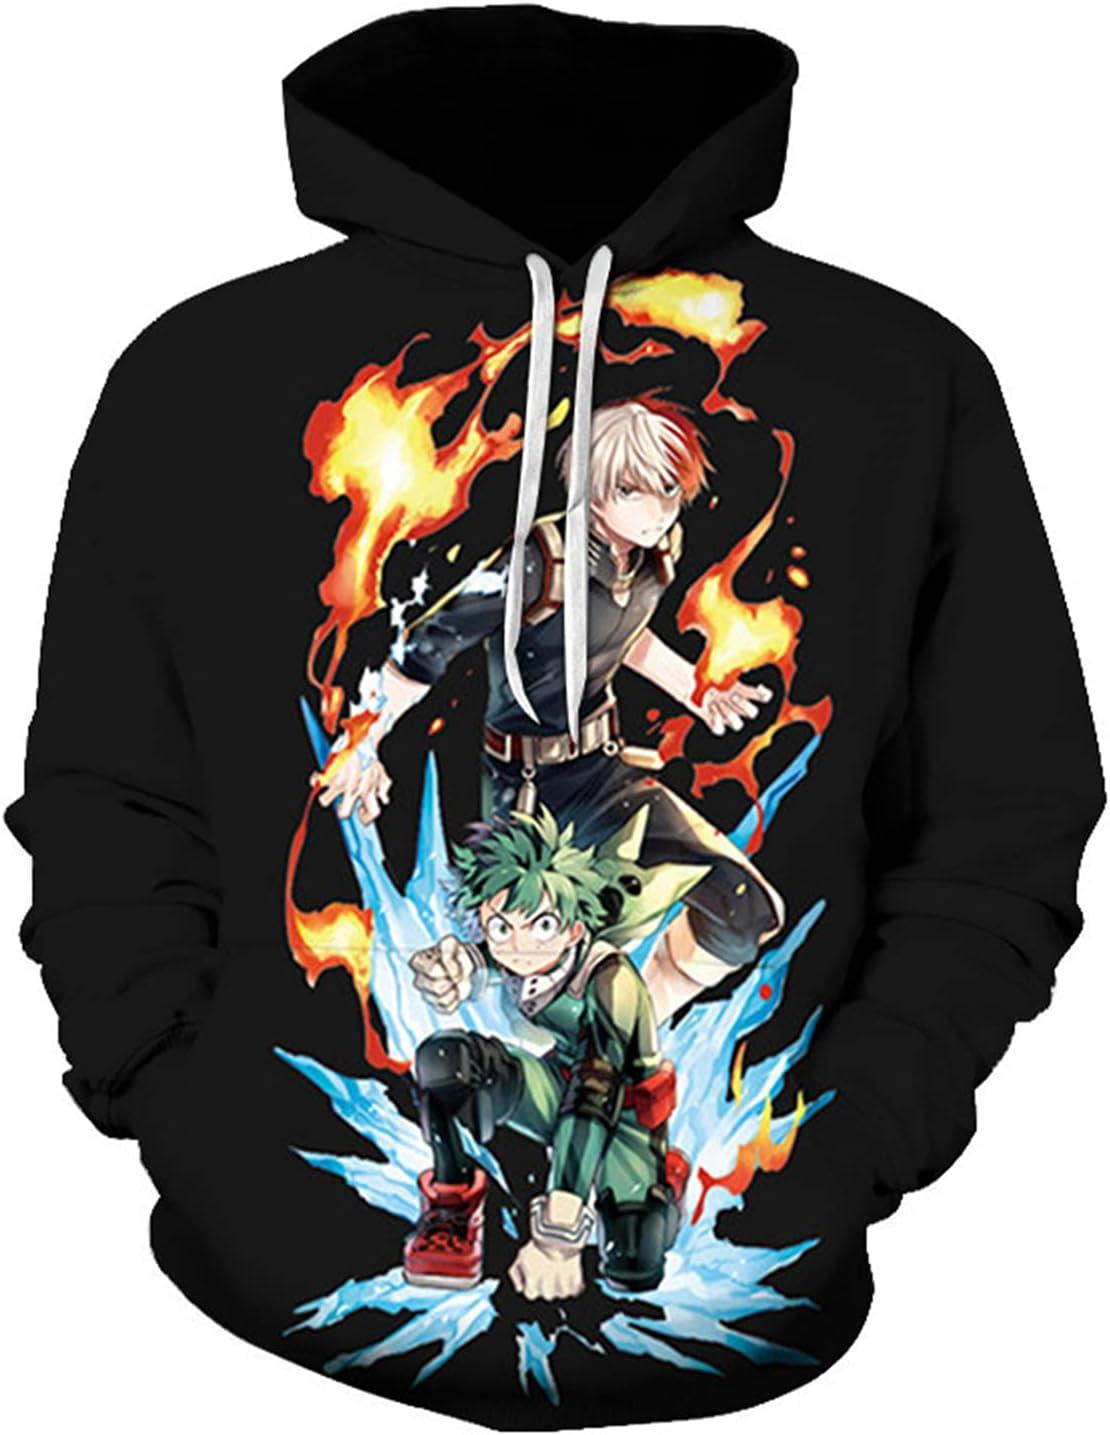 NEW before selling Cheap bargain RTGB My Hero Academia Hoodie Pullover Casual Co Sweatshirt Loose